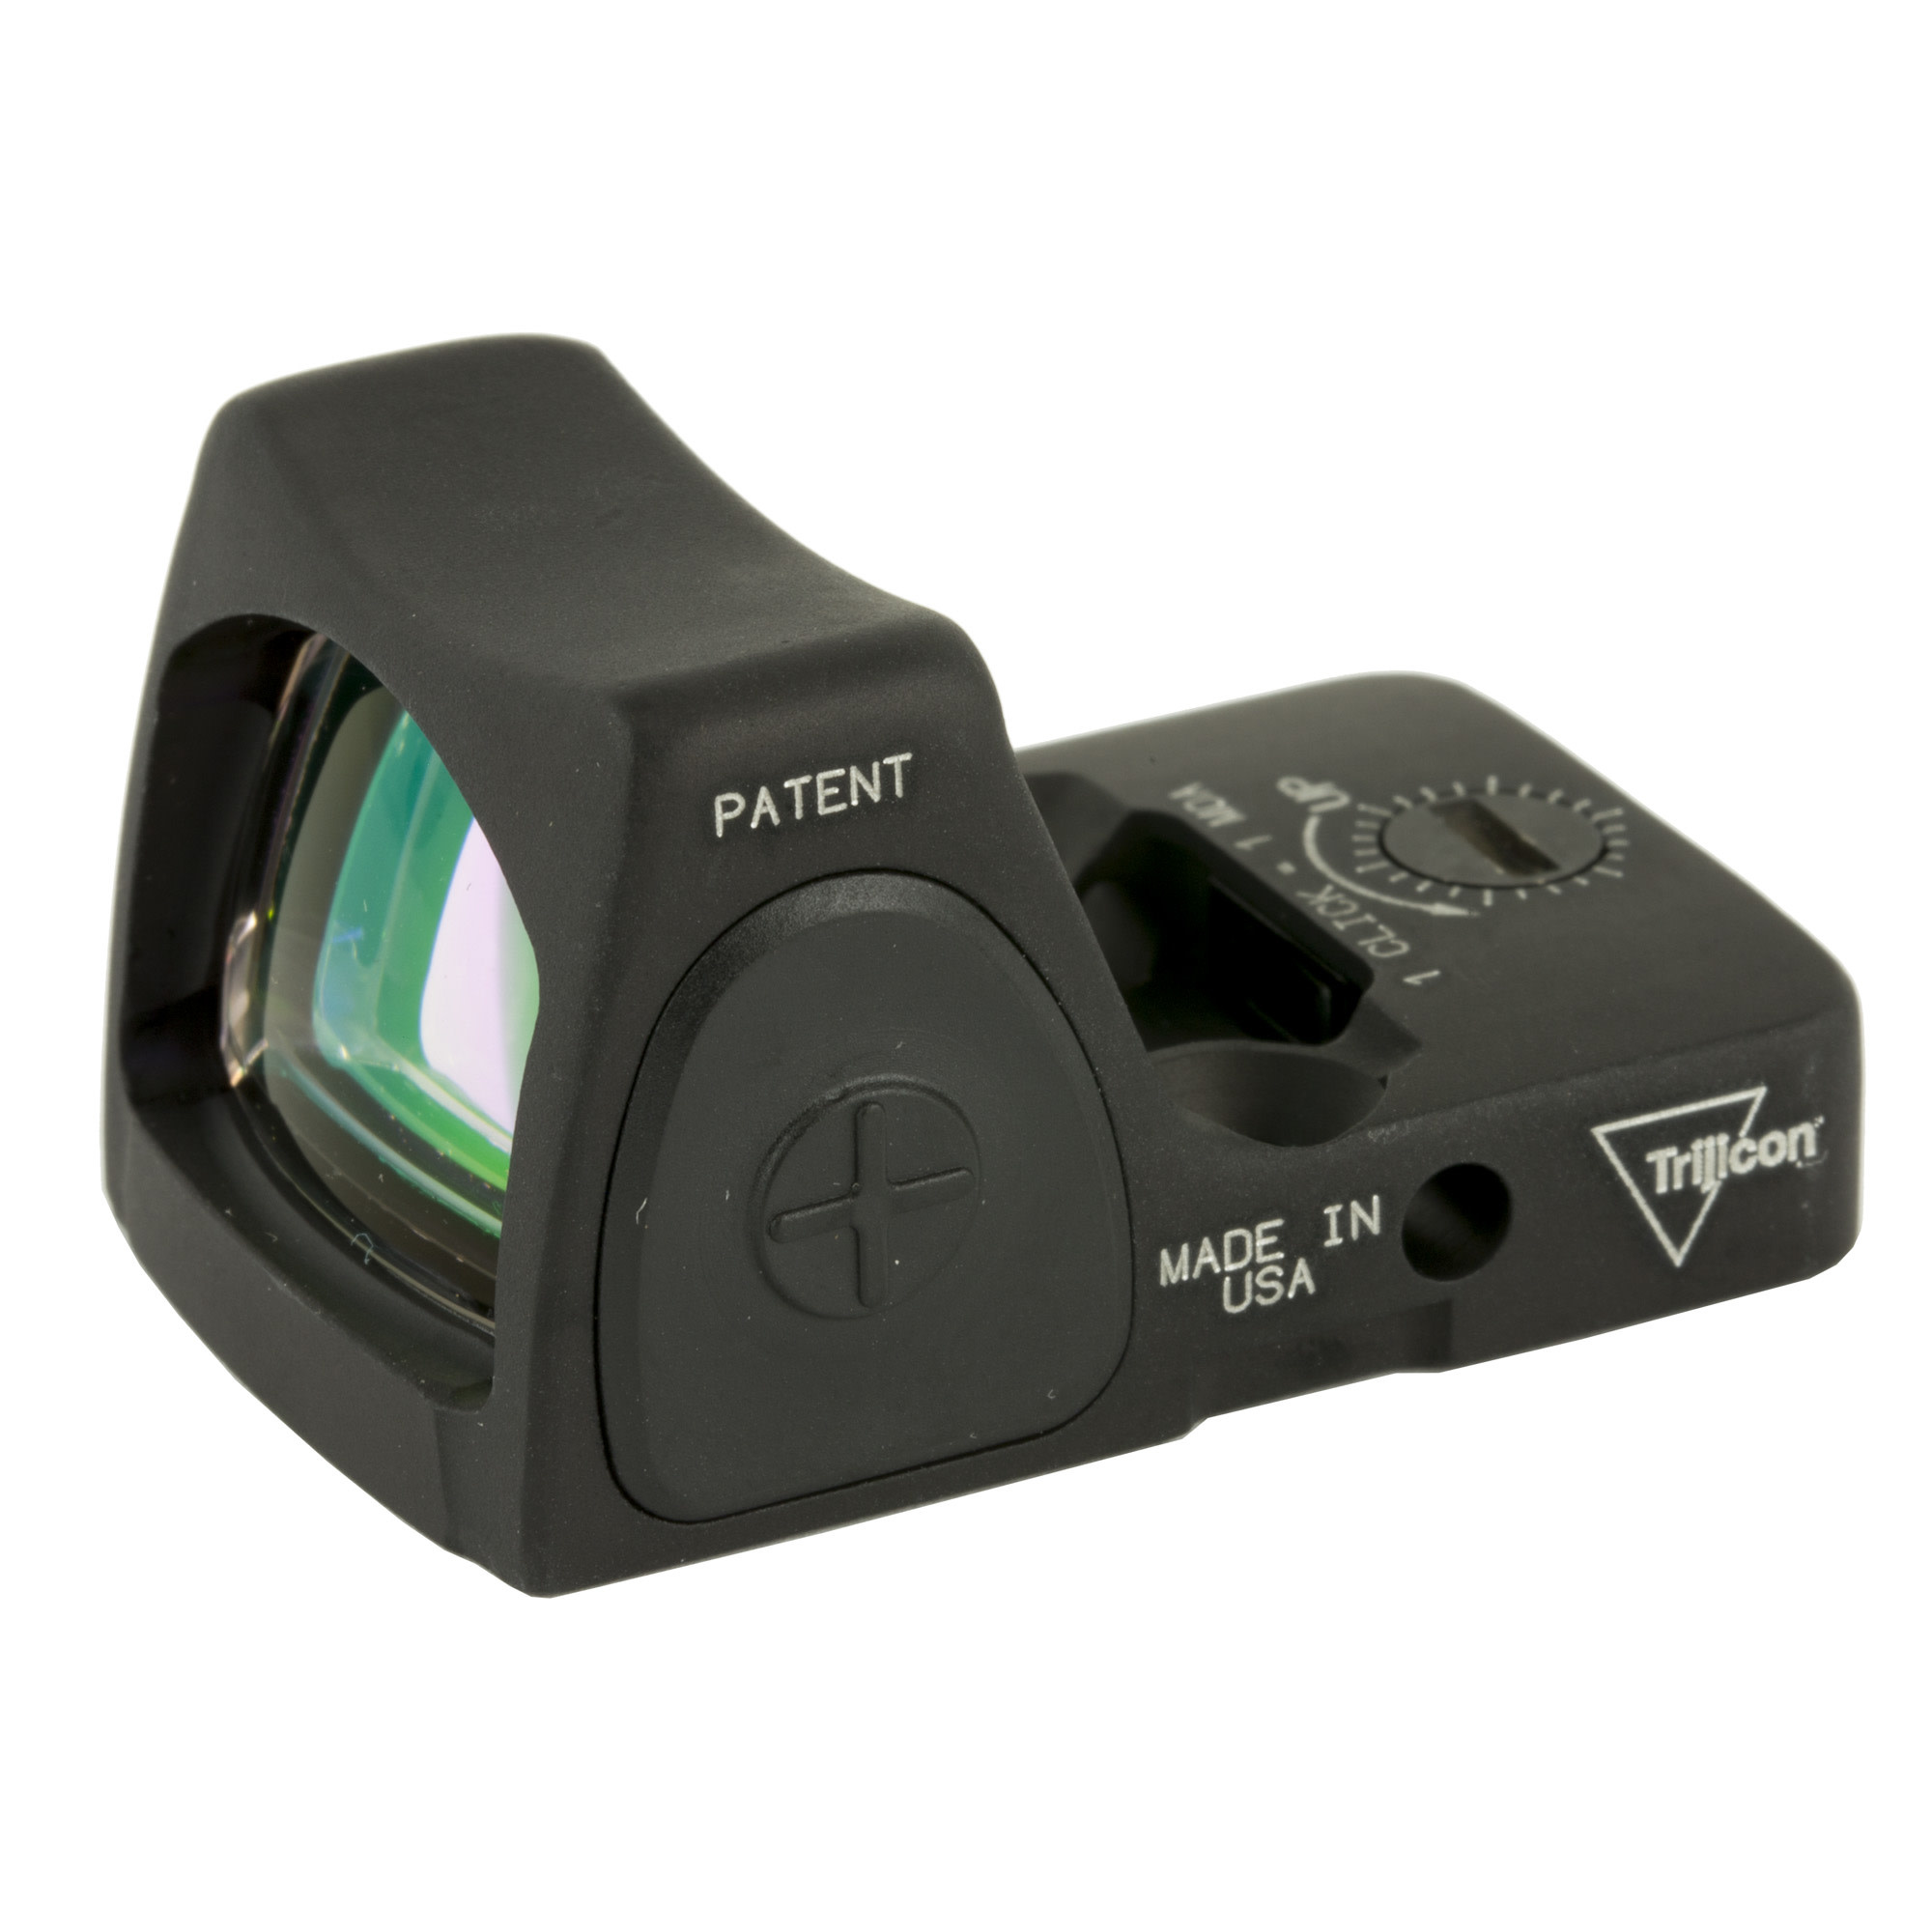 Trijicon RM06 Type 2 adjustable LED RMR, 3.25 MOA dot